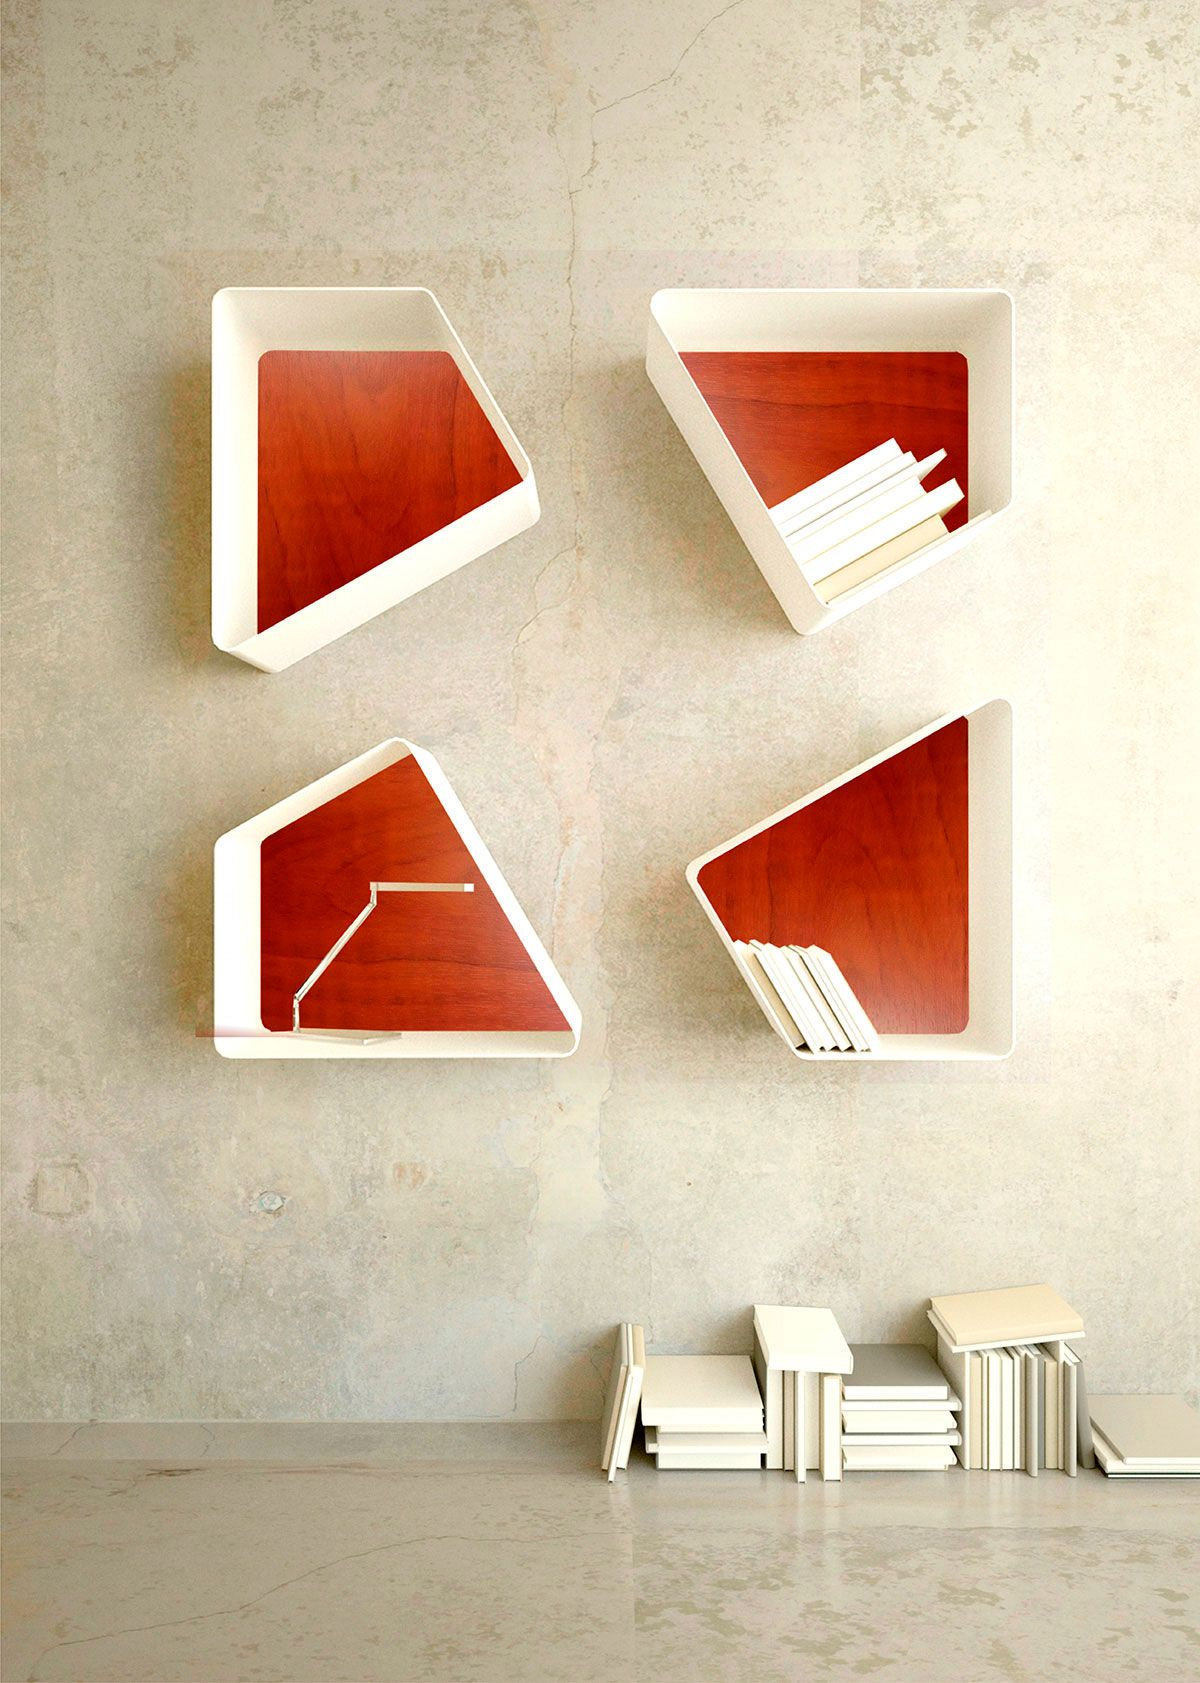 Estanteria libreria modular dise o interiores muebles for Diseno de muebles de madera modernos